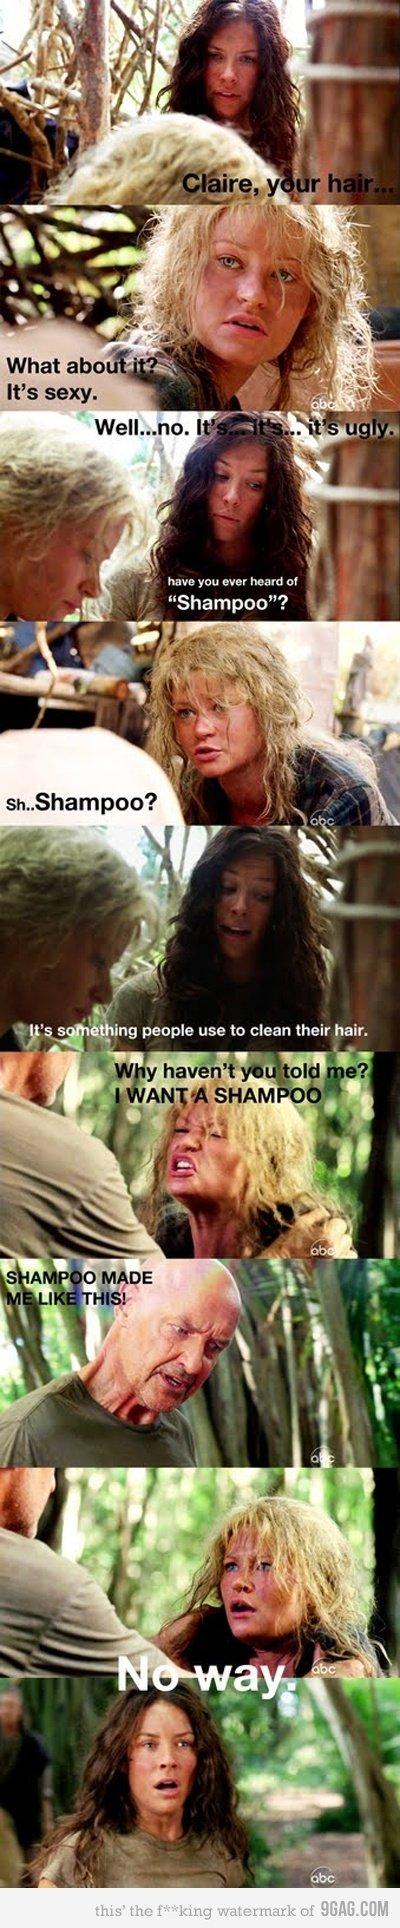 Shampoo. I don't ever want to go bald... lol tags